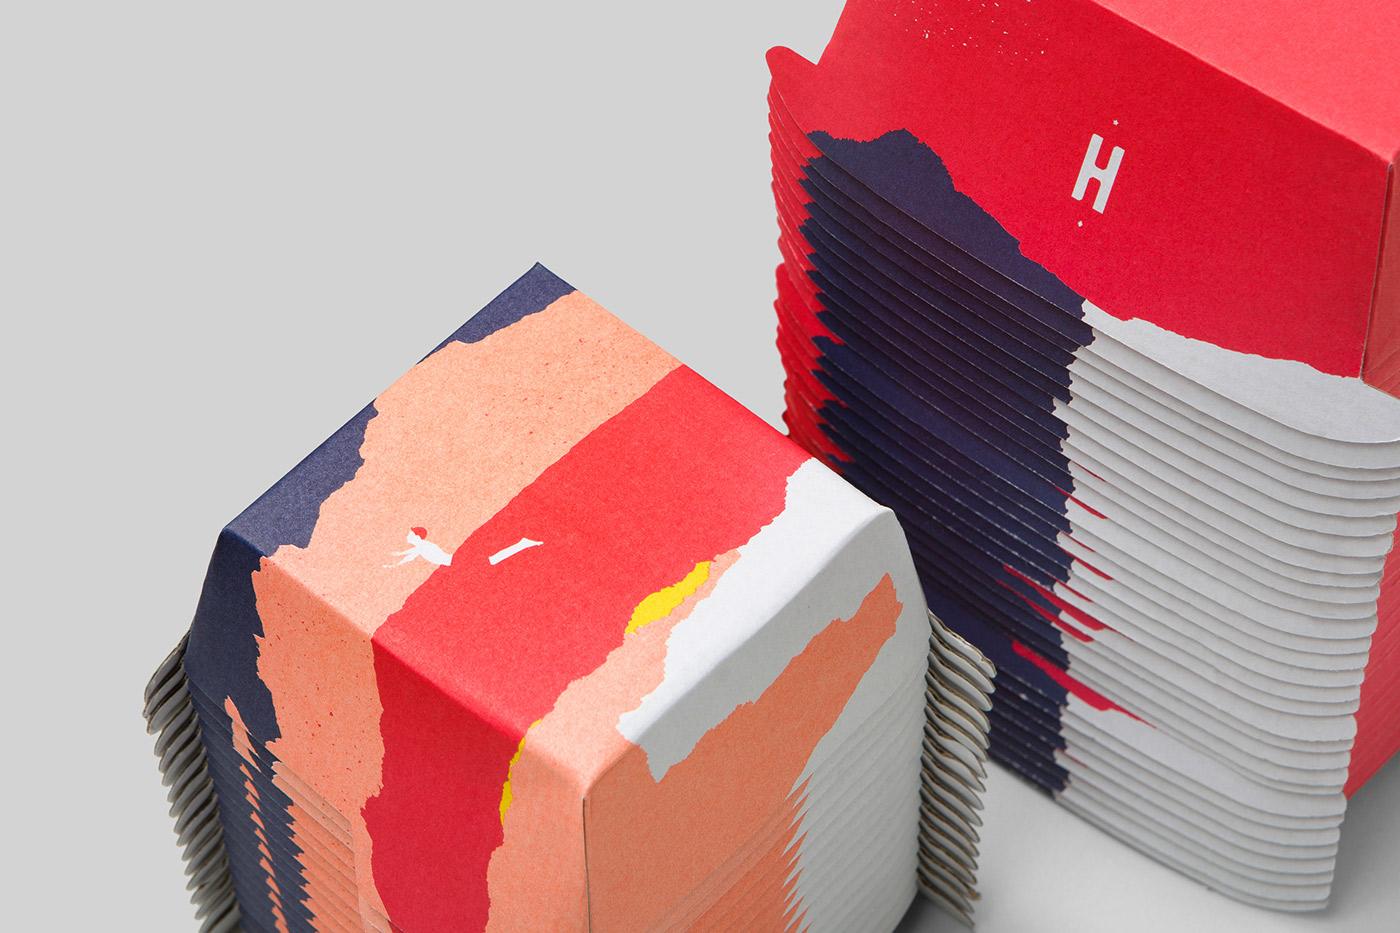 Packaging & Graphic Design - Huxtaburger by Pop & Pac